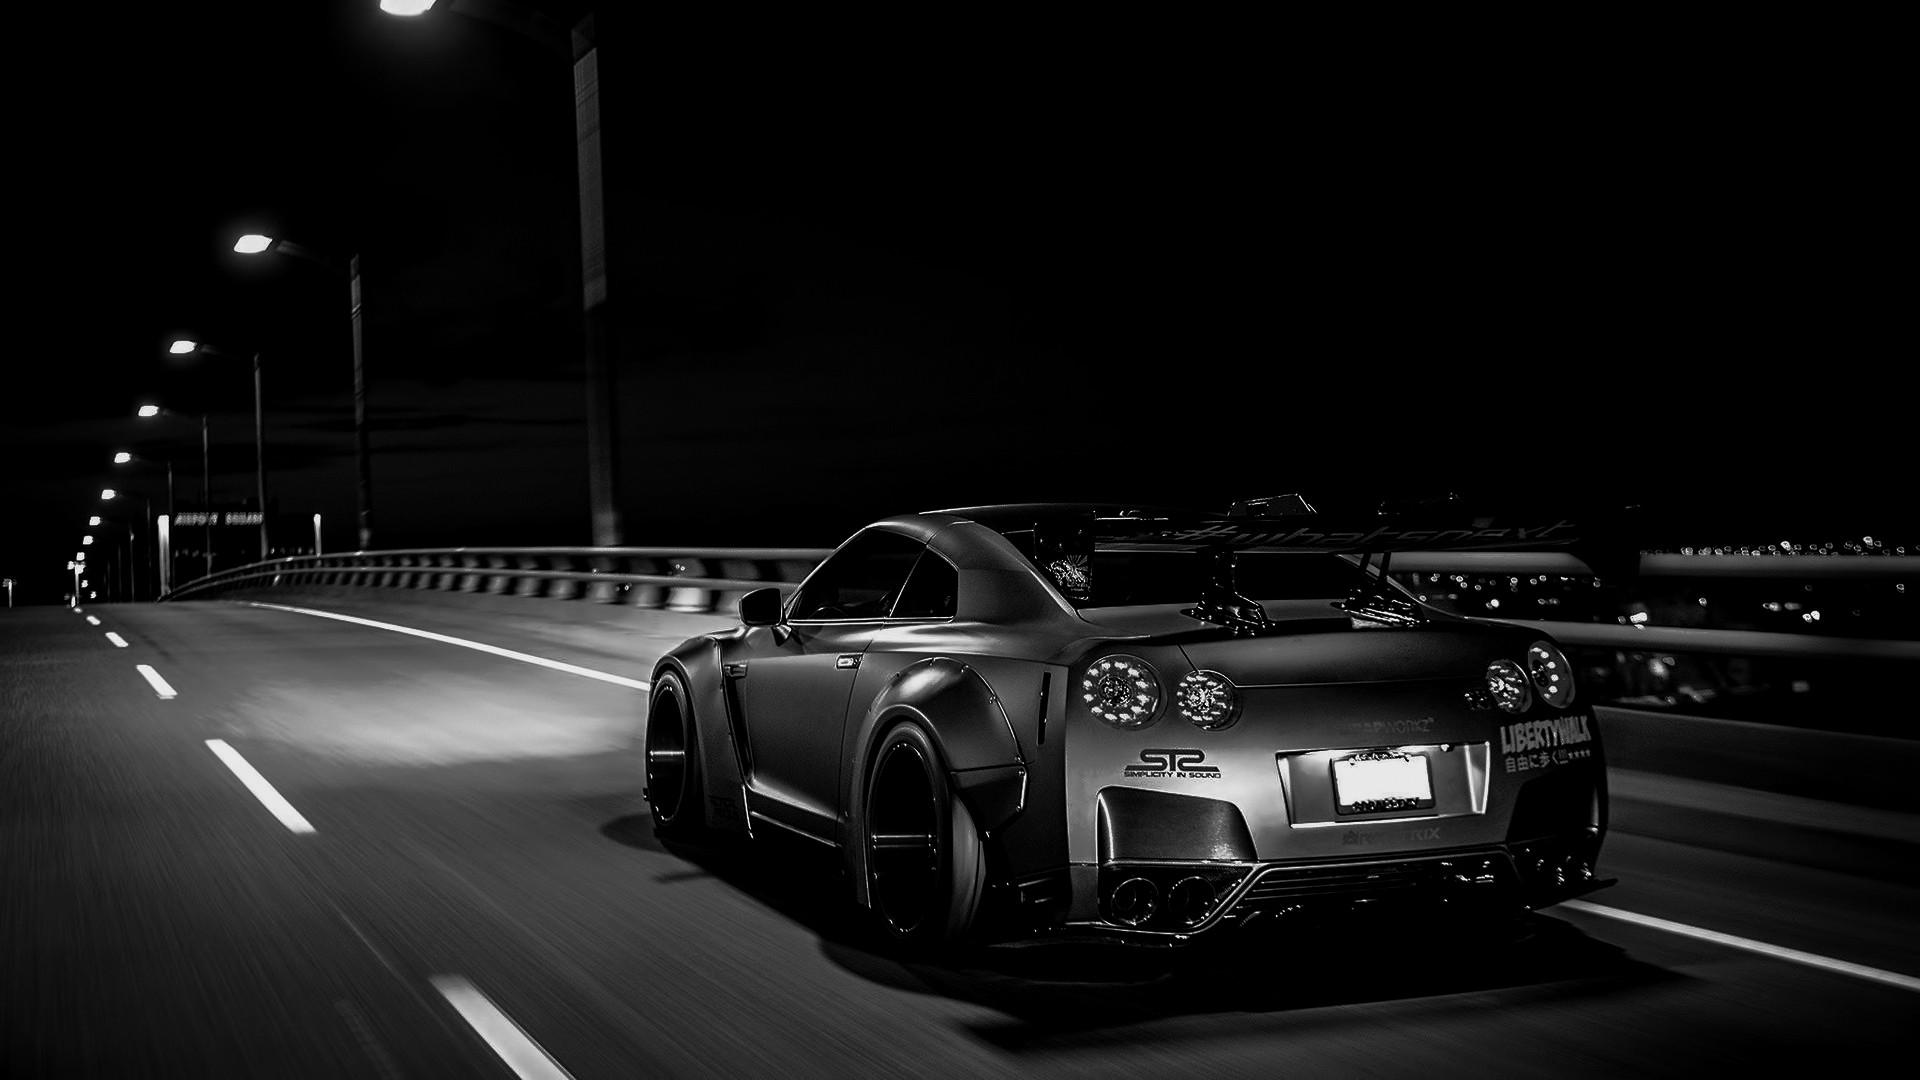 Monochrome Car Vehicle Nissan GTR Sports Car Nissan Skyline GT R R35 Tuning  Performance Car Liberty